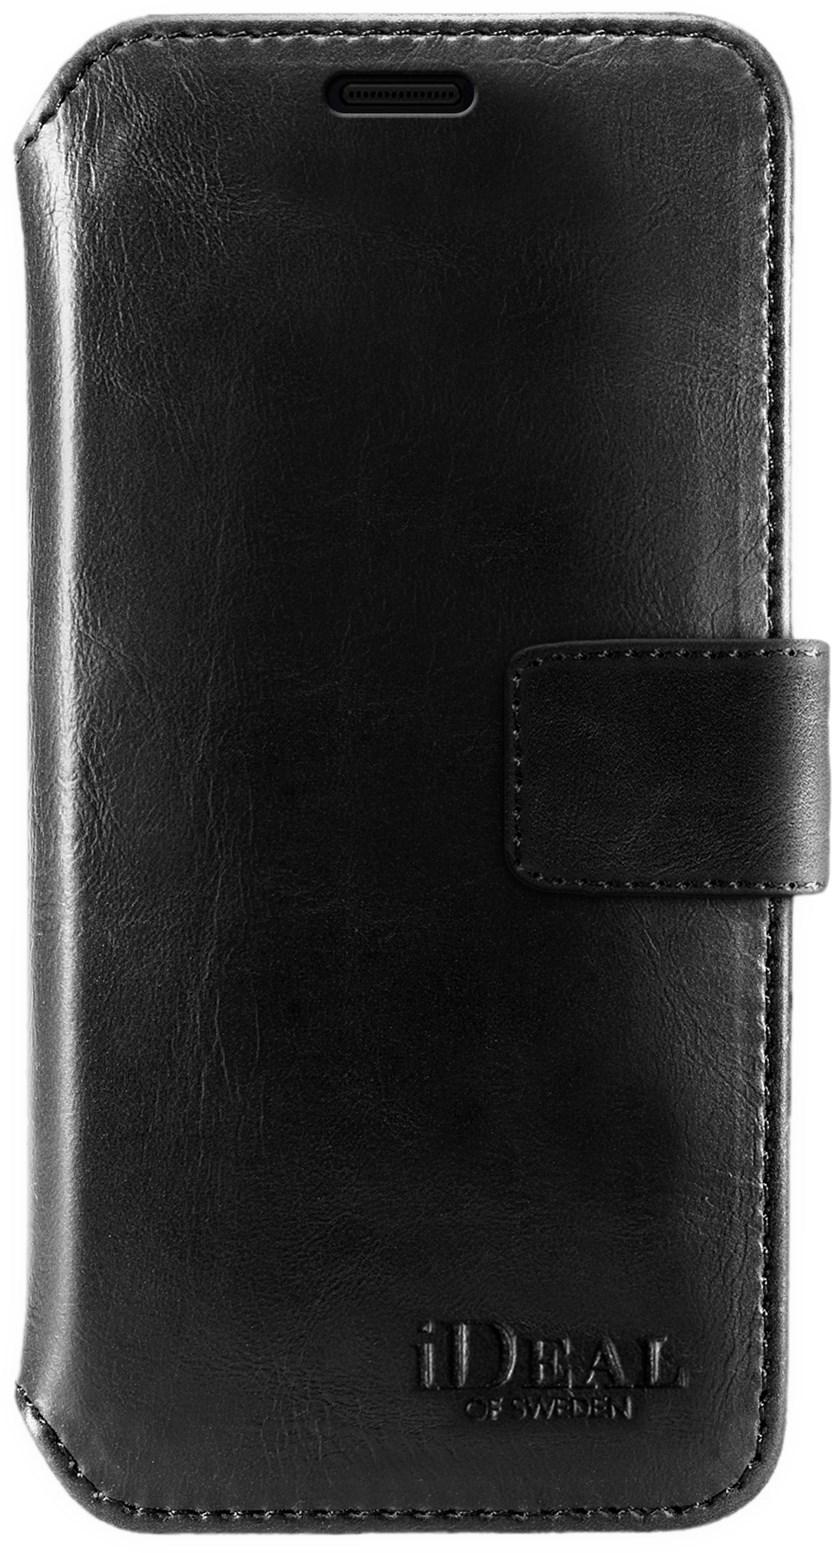 iDeal of Sweden Ideal Sthlm Wallet Huawei P30 Black